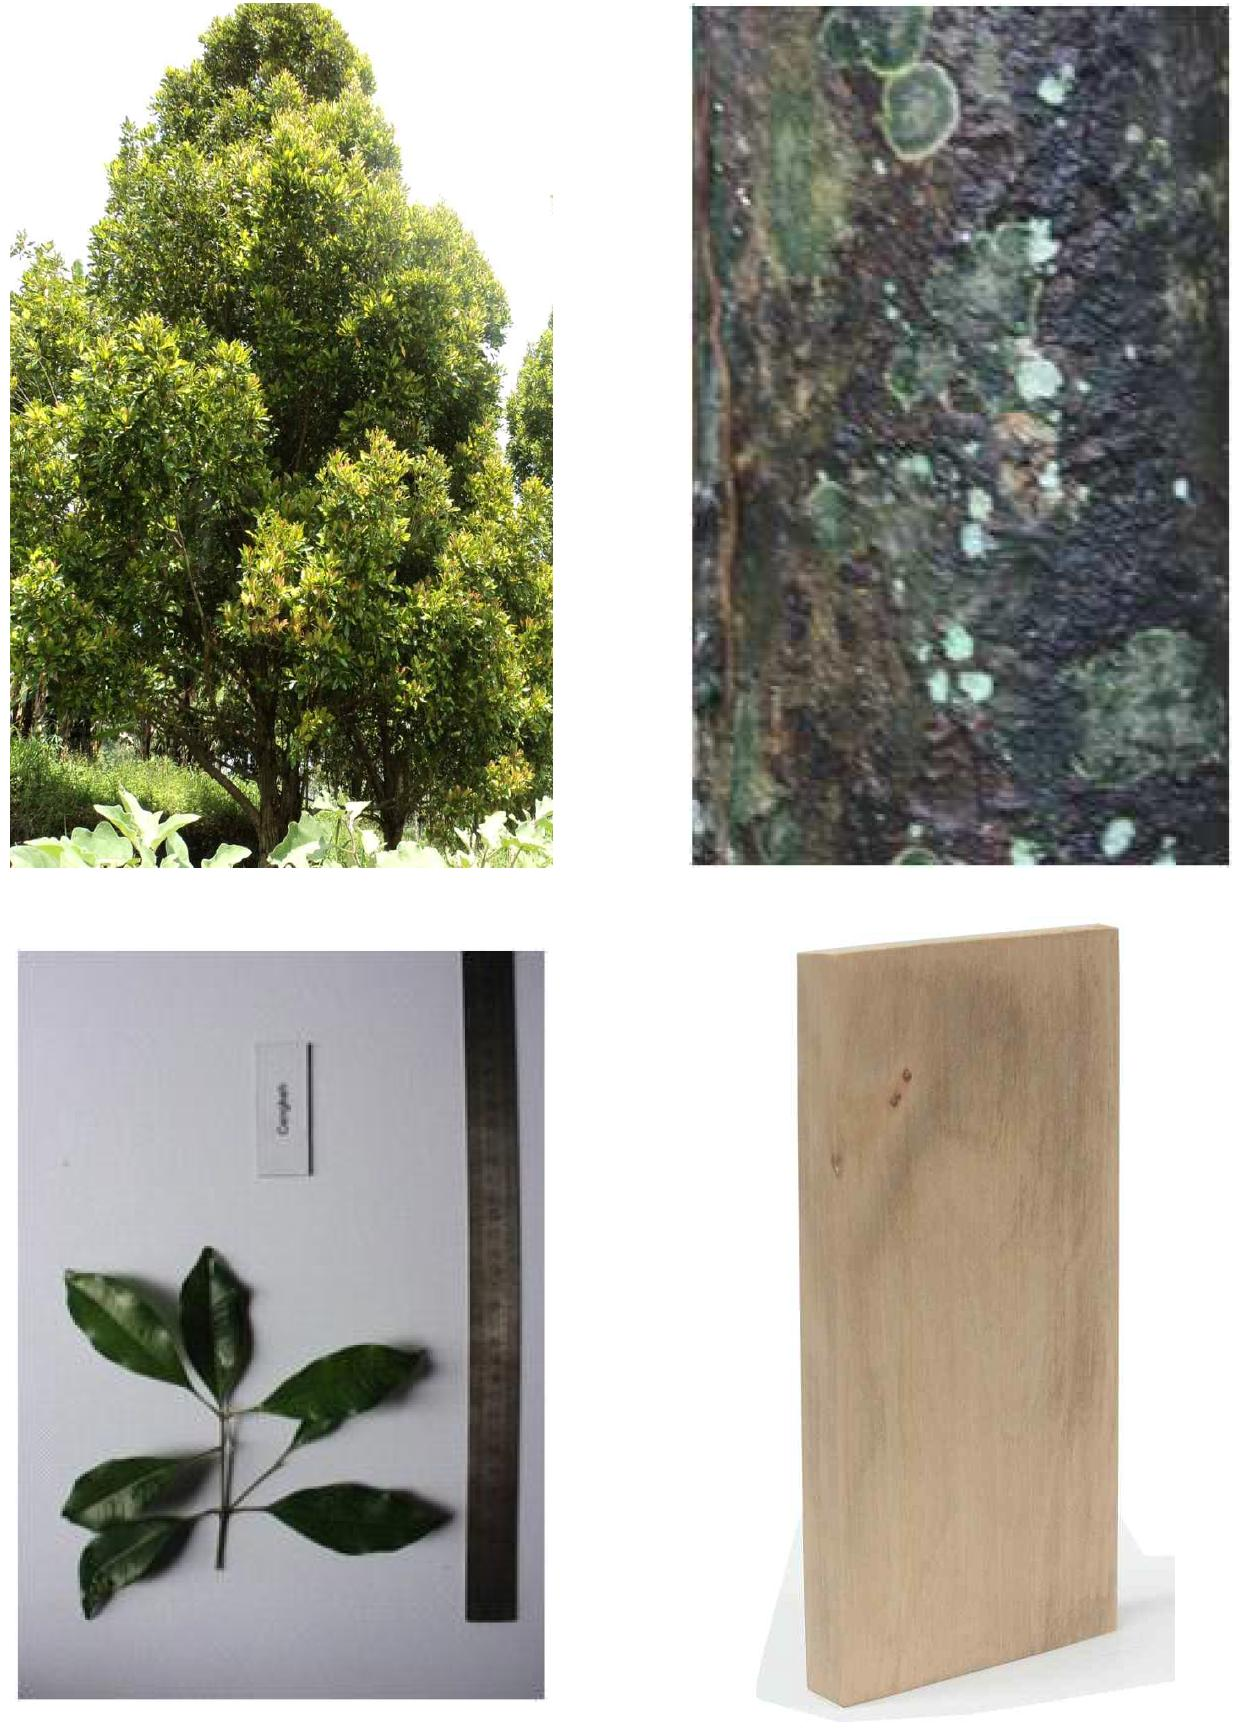 Cengkeh의 전체수형, 수피, 잎 및 재면.